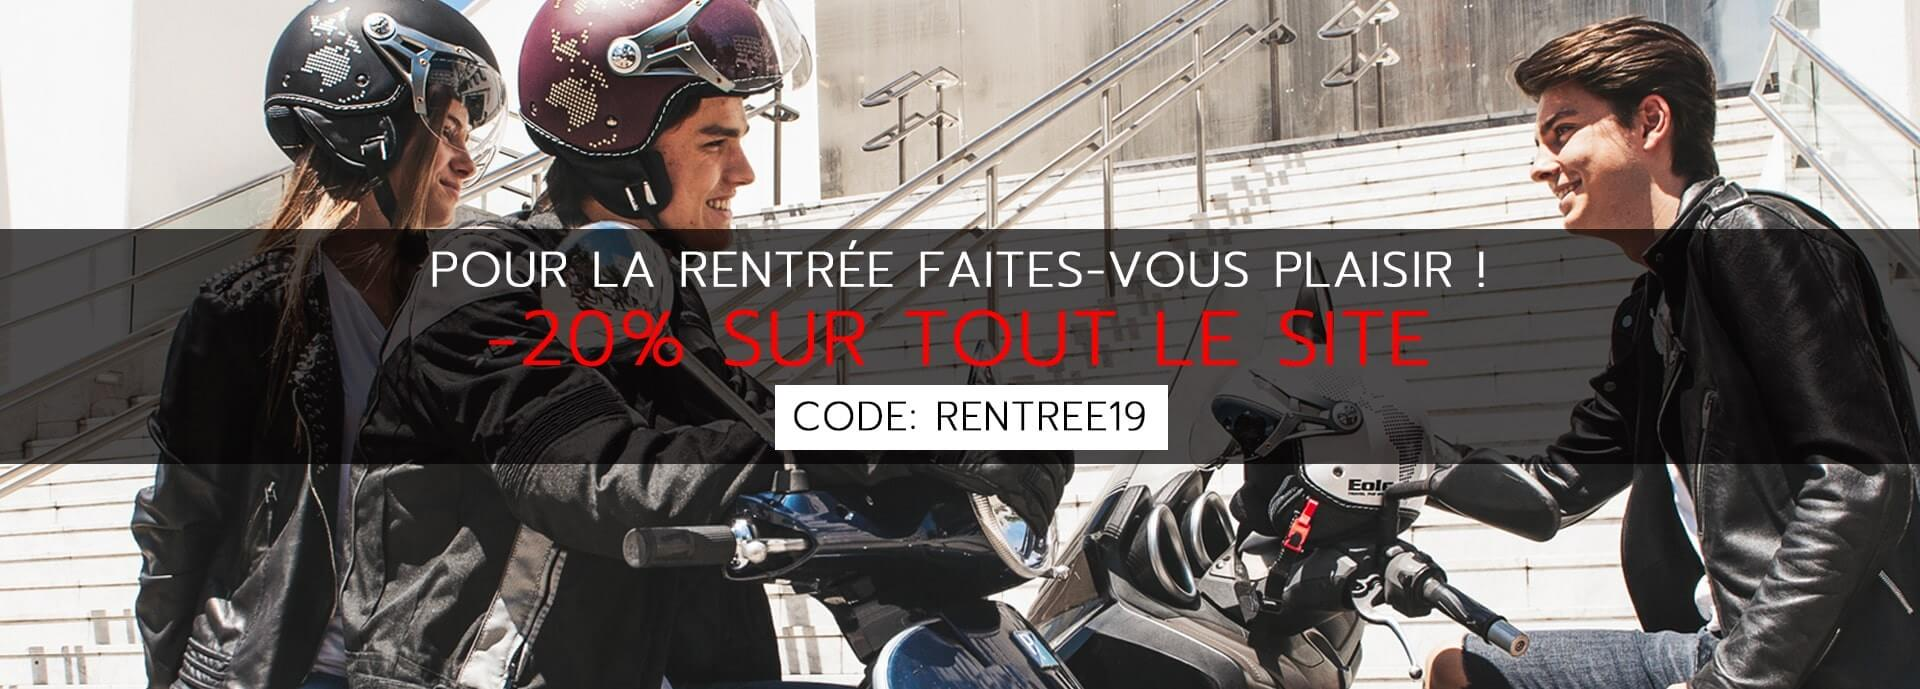 Slider rentrée code promo: RENTREE19